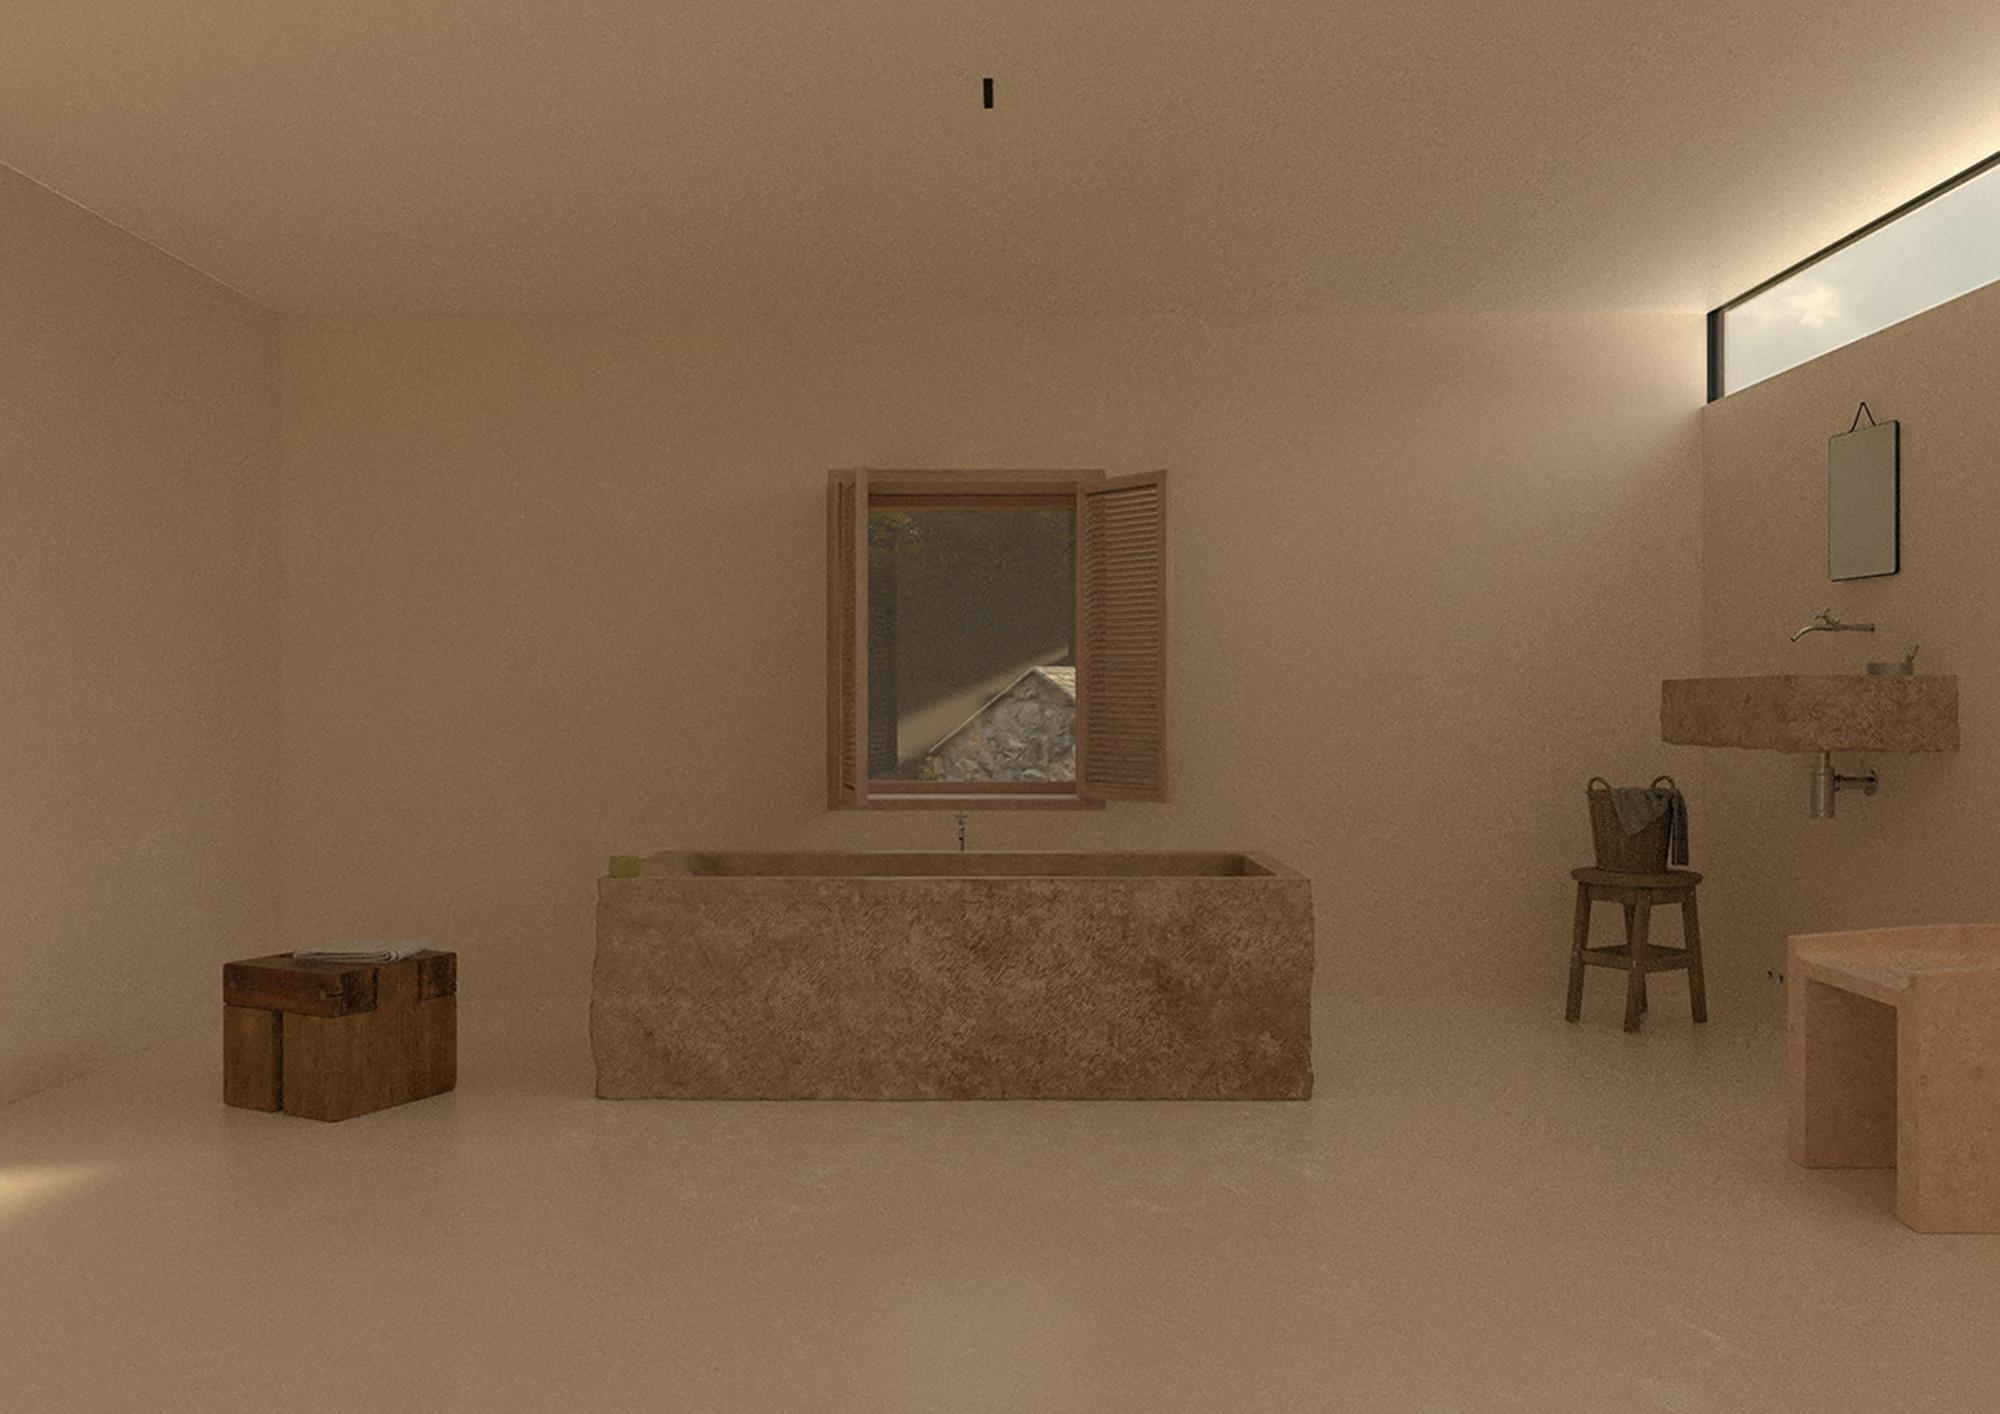 Computer-generated image of Maison's bare-bones bathroom.